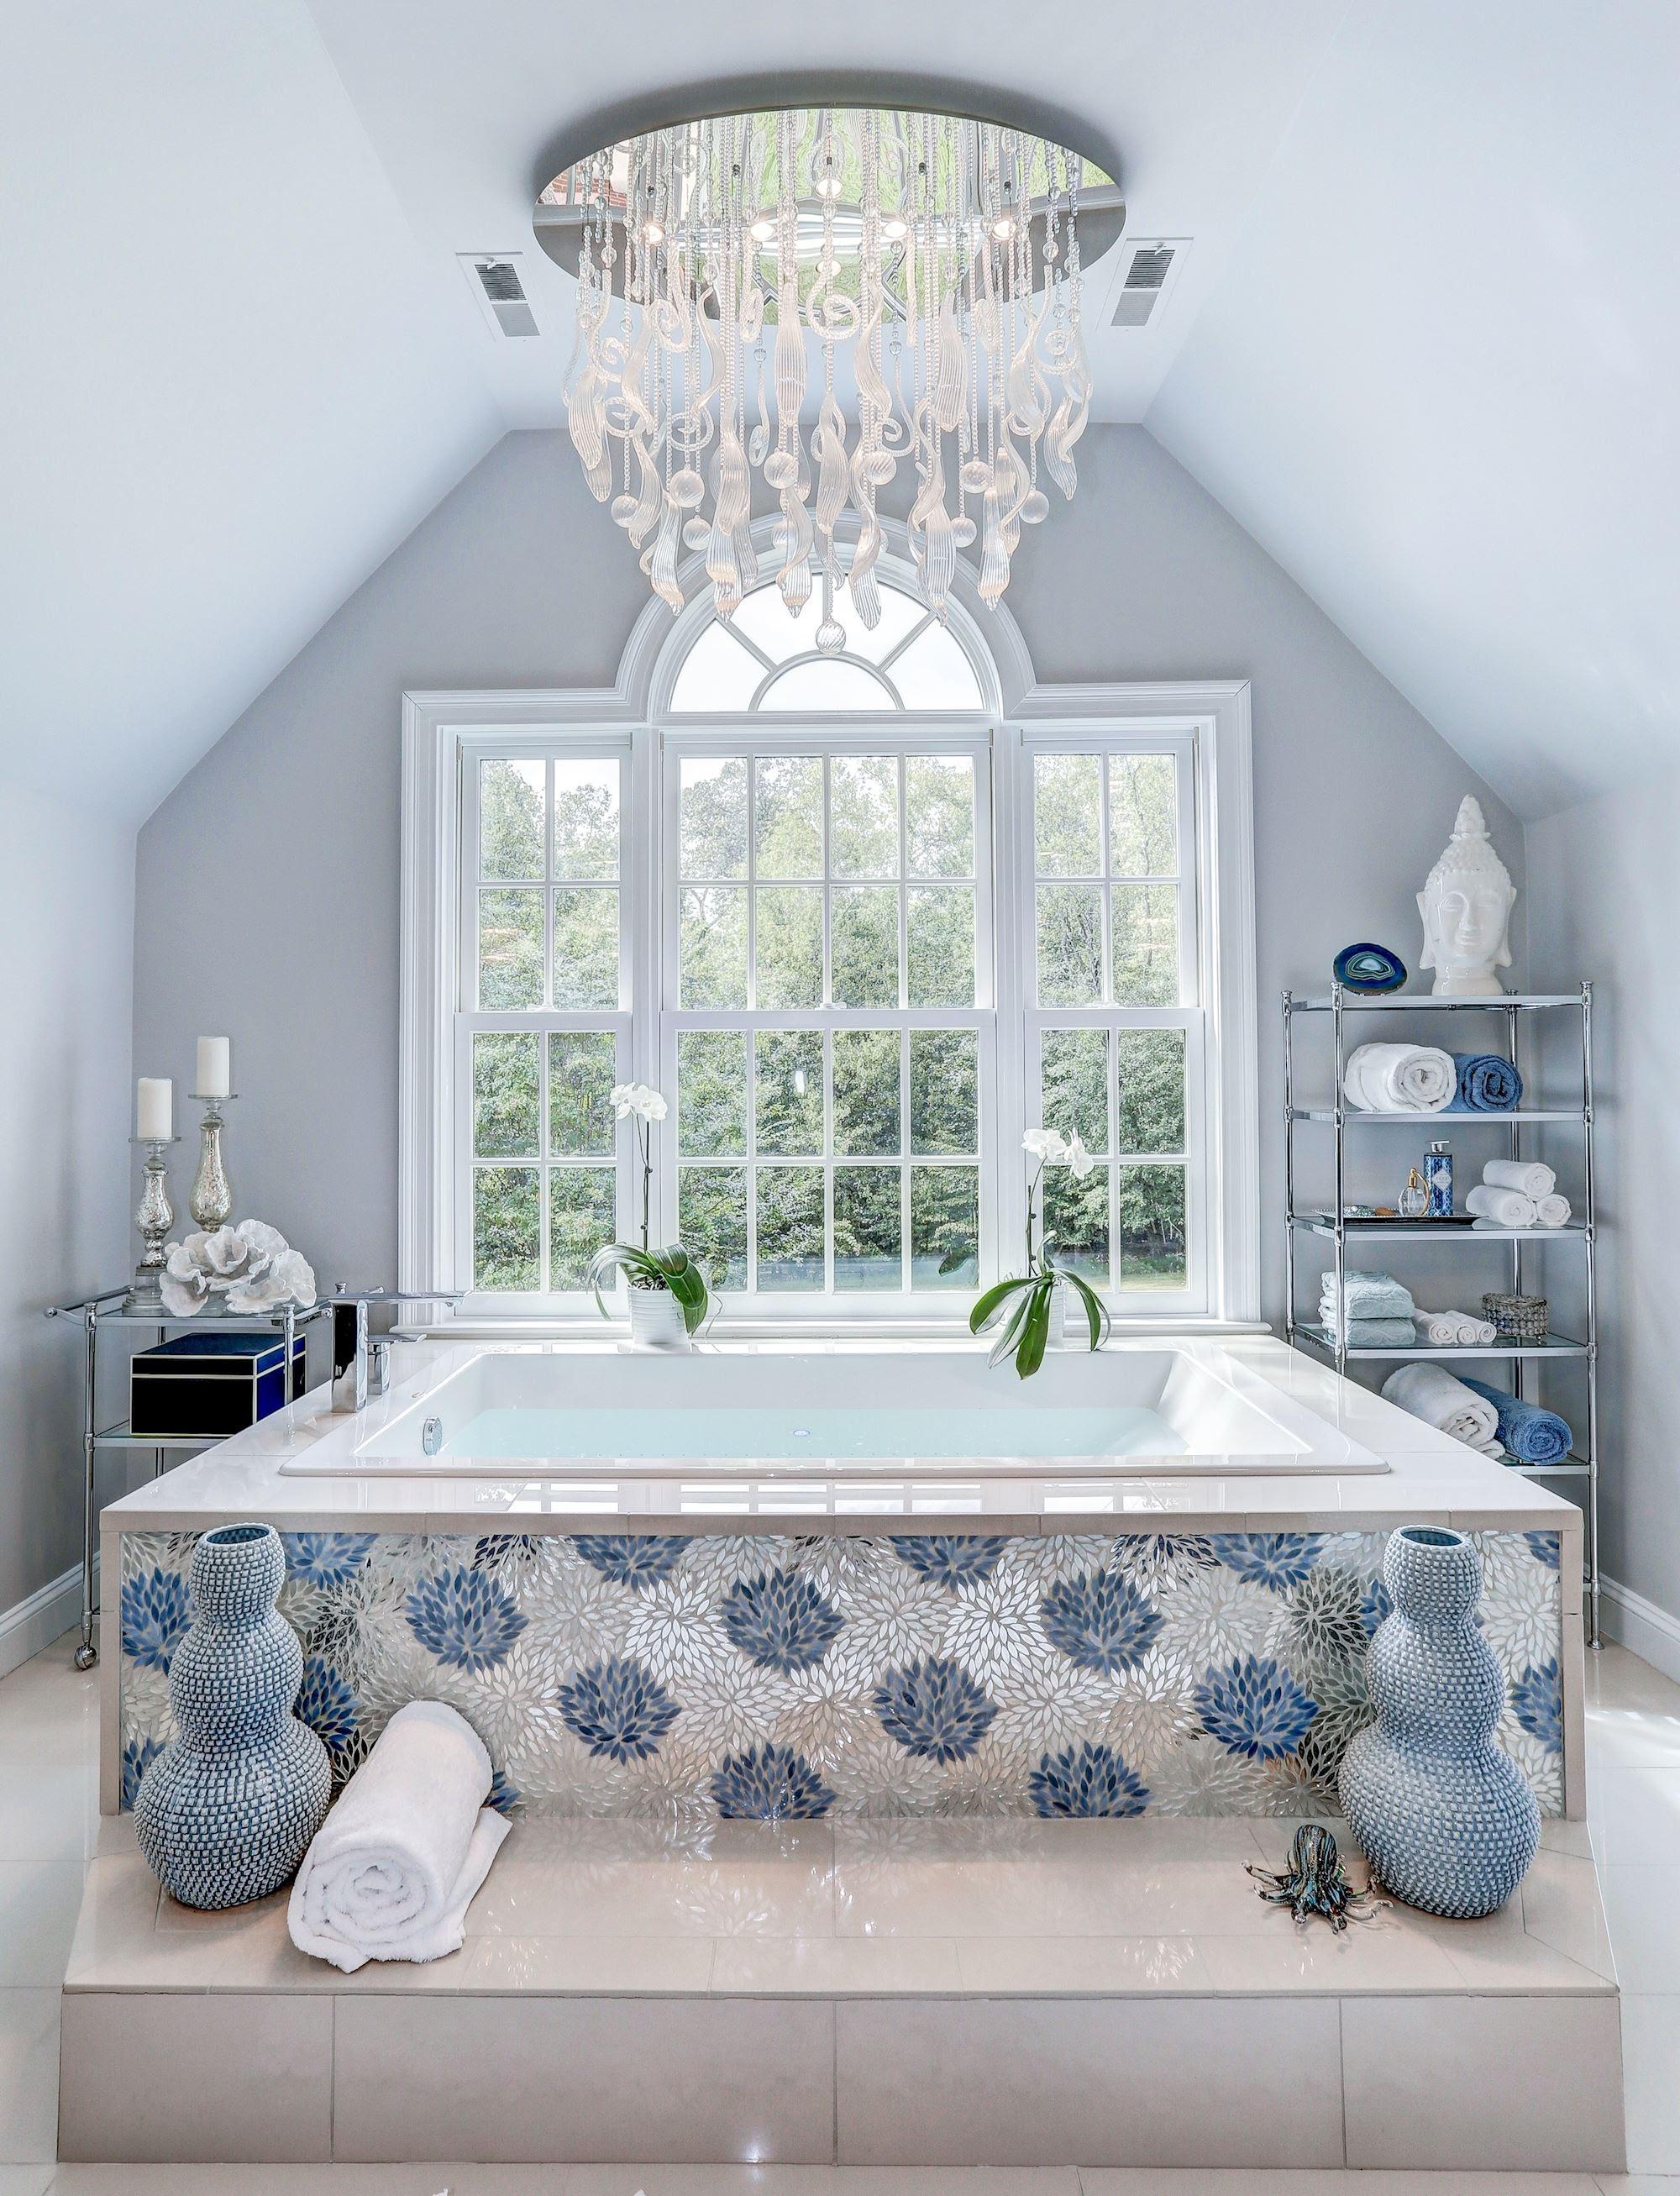 Virtual Interior Design Kitchen or Bath